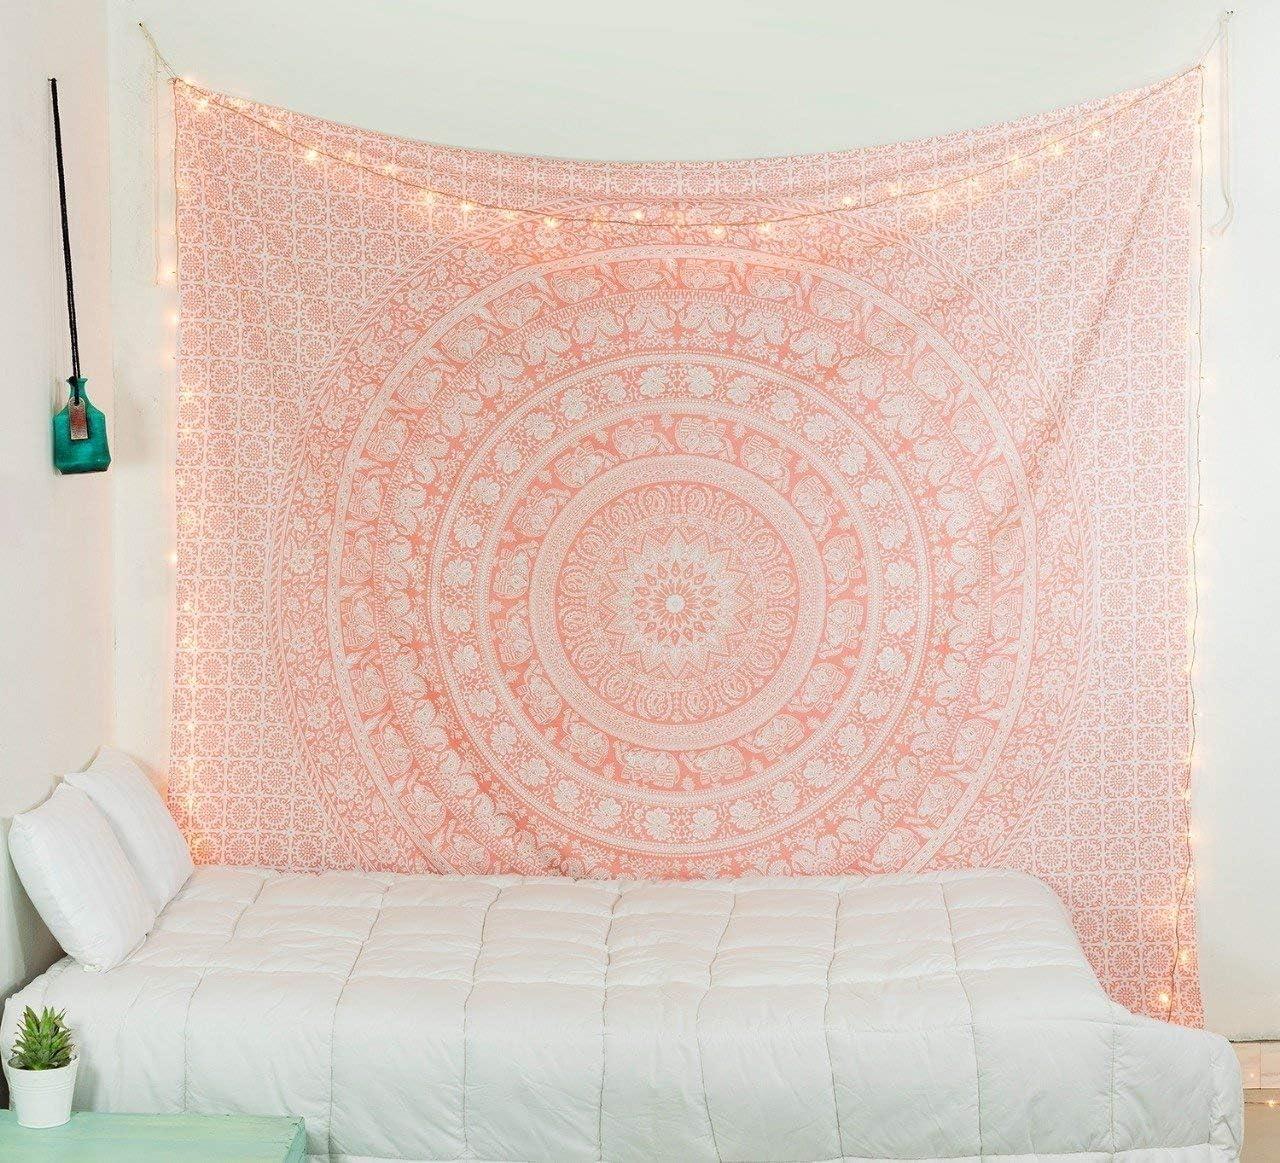 Popular Handicrafts Tapesties Hippie sold out Man 5 ☆ popular Tapestry Mandala